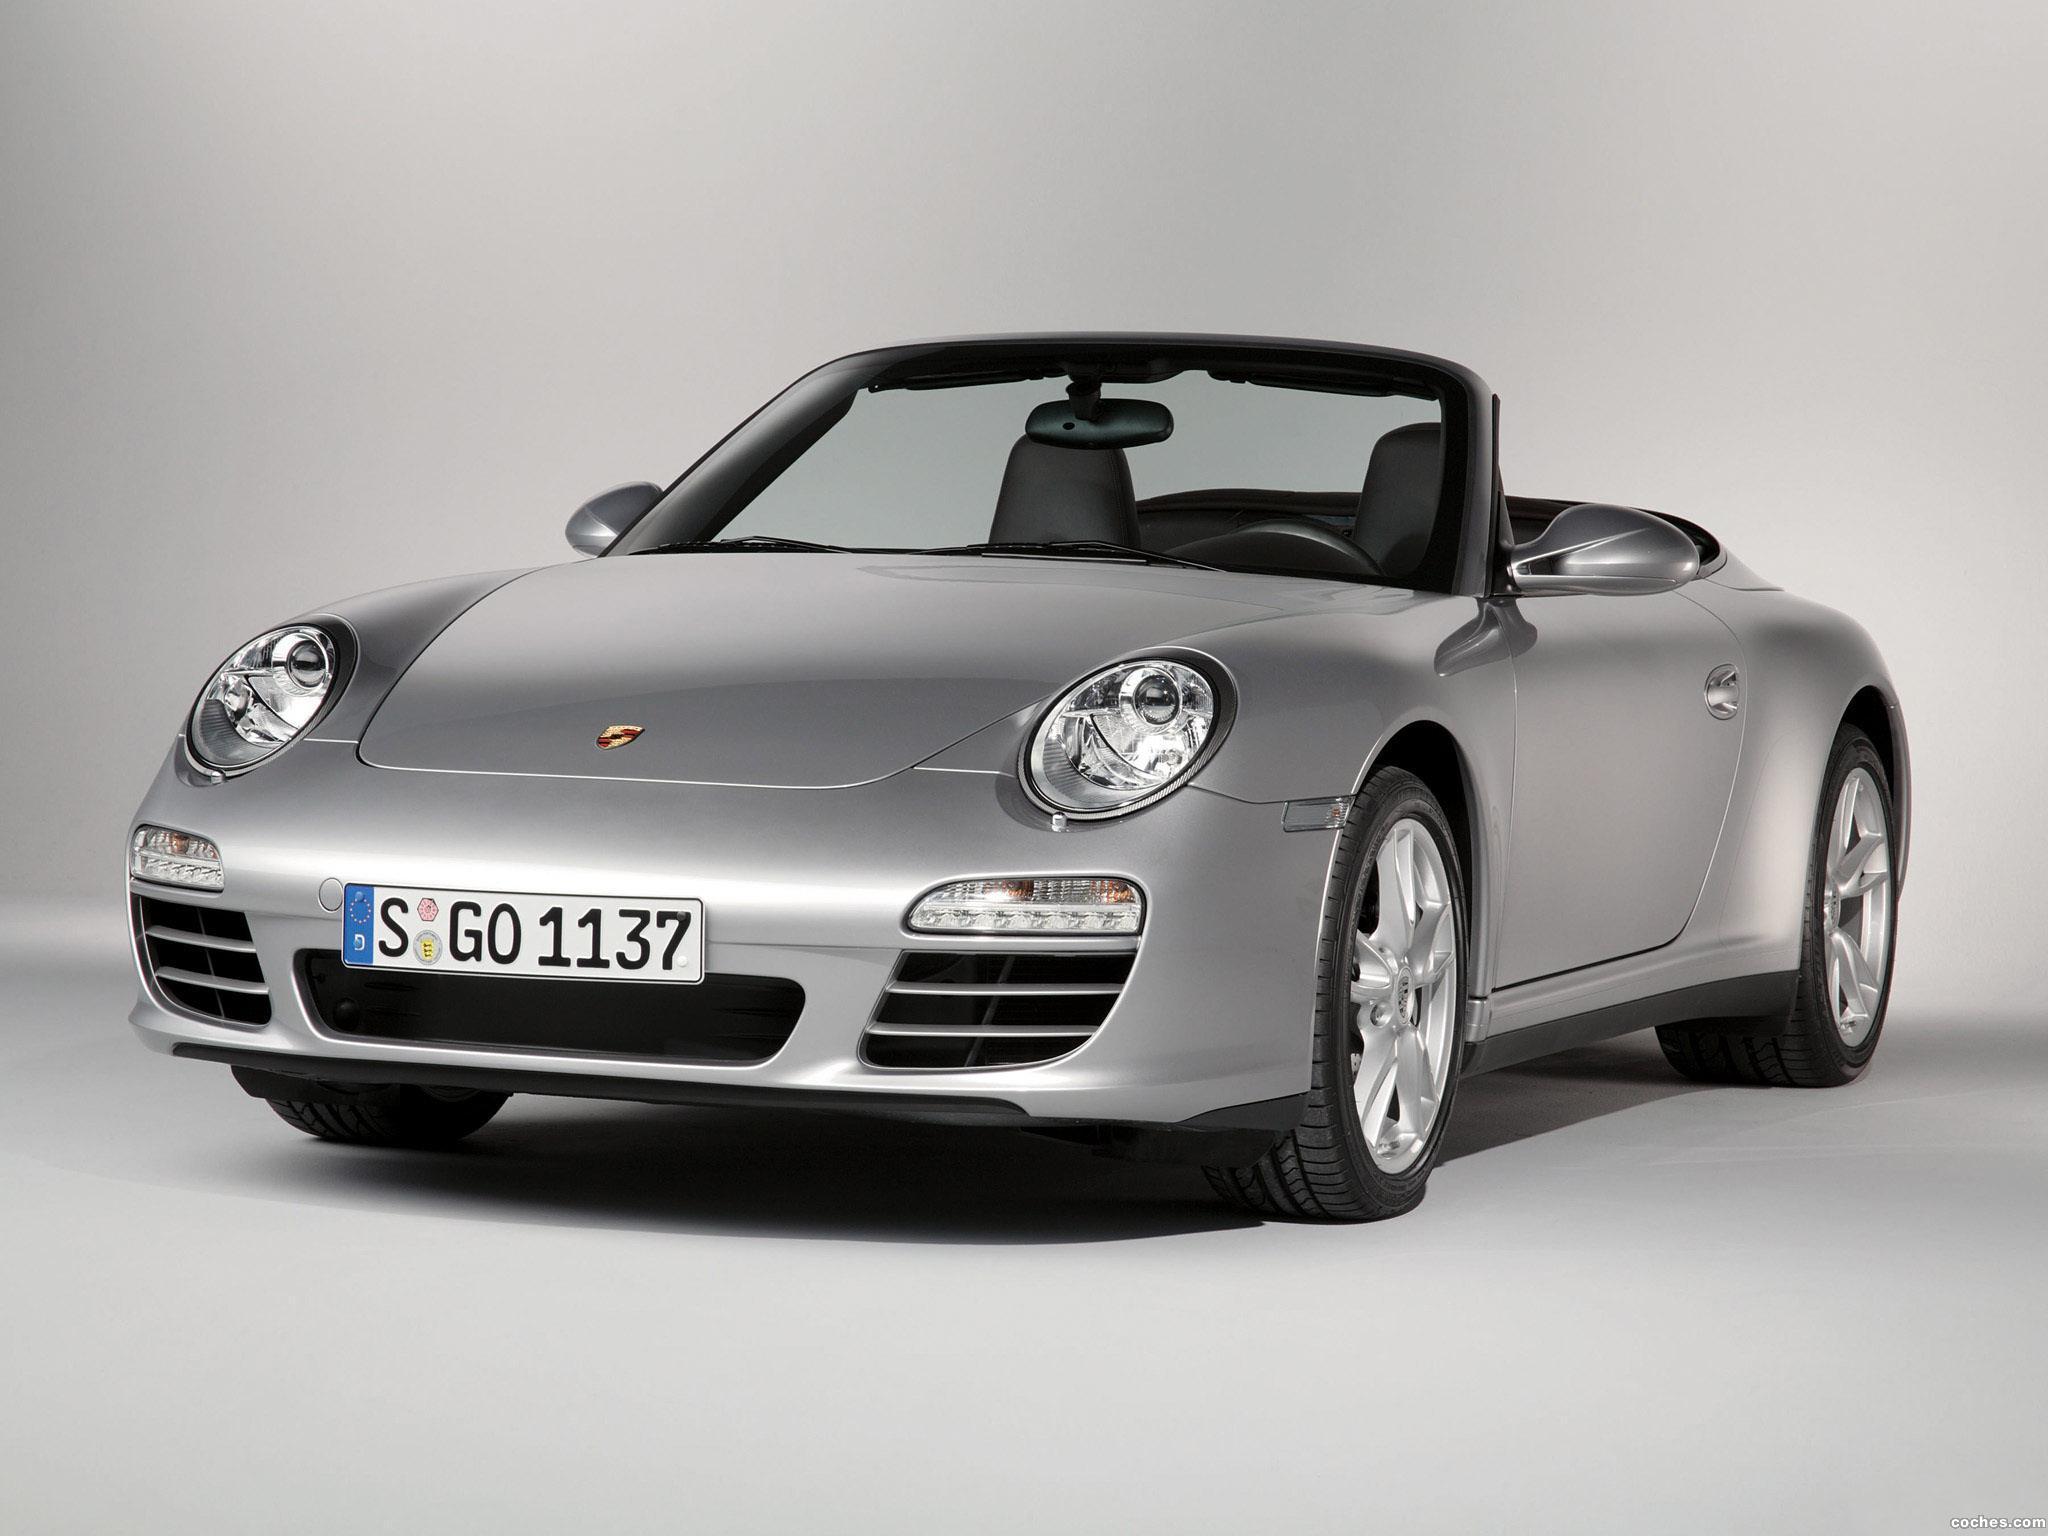 porsche 911 carrera 4 cabriolet 997 2008 r8 Porsche 911 Carrera 4 ...